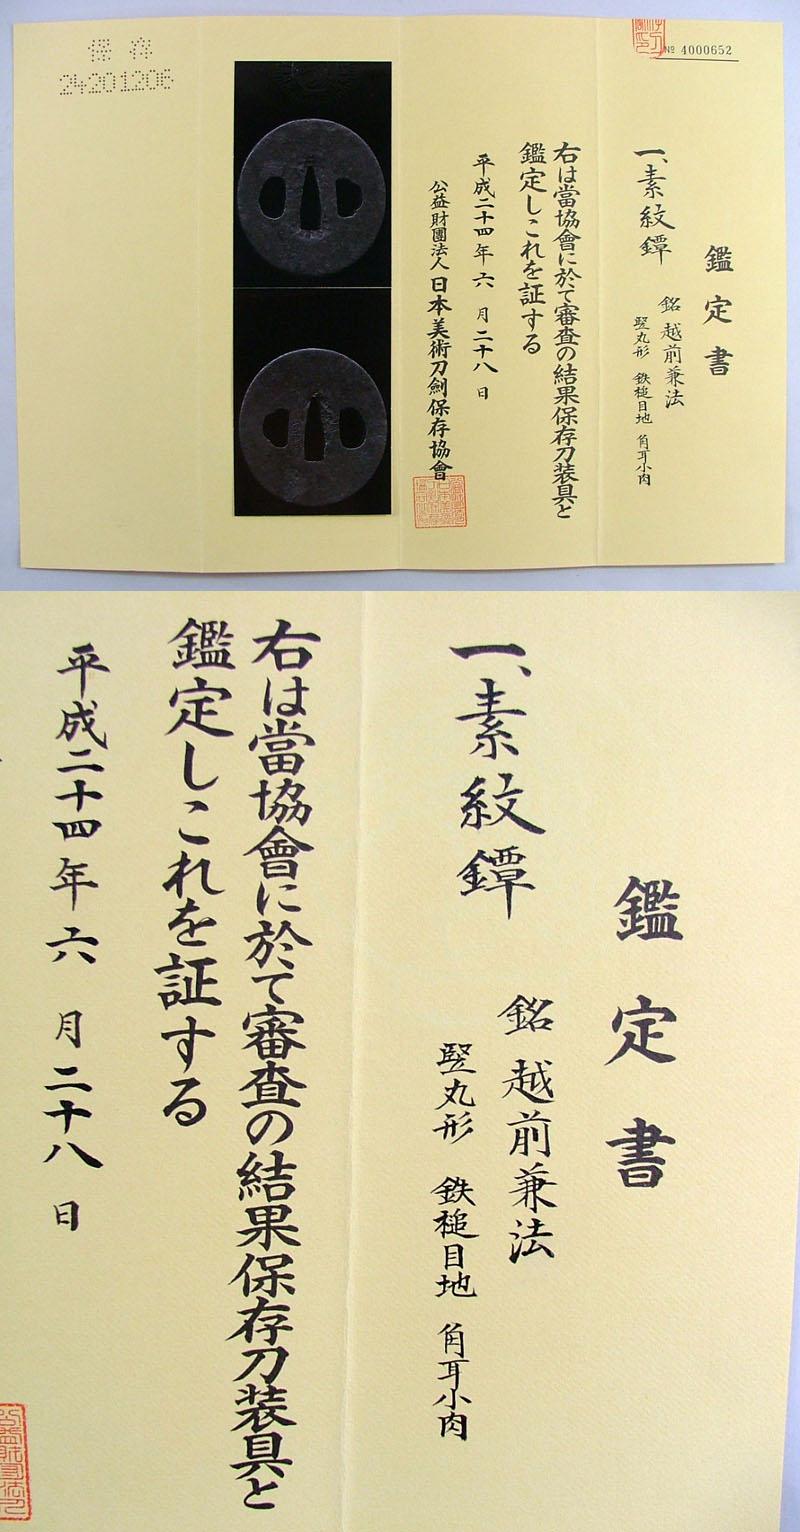 素紋鍔 越前兼法 Picture of Certificate